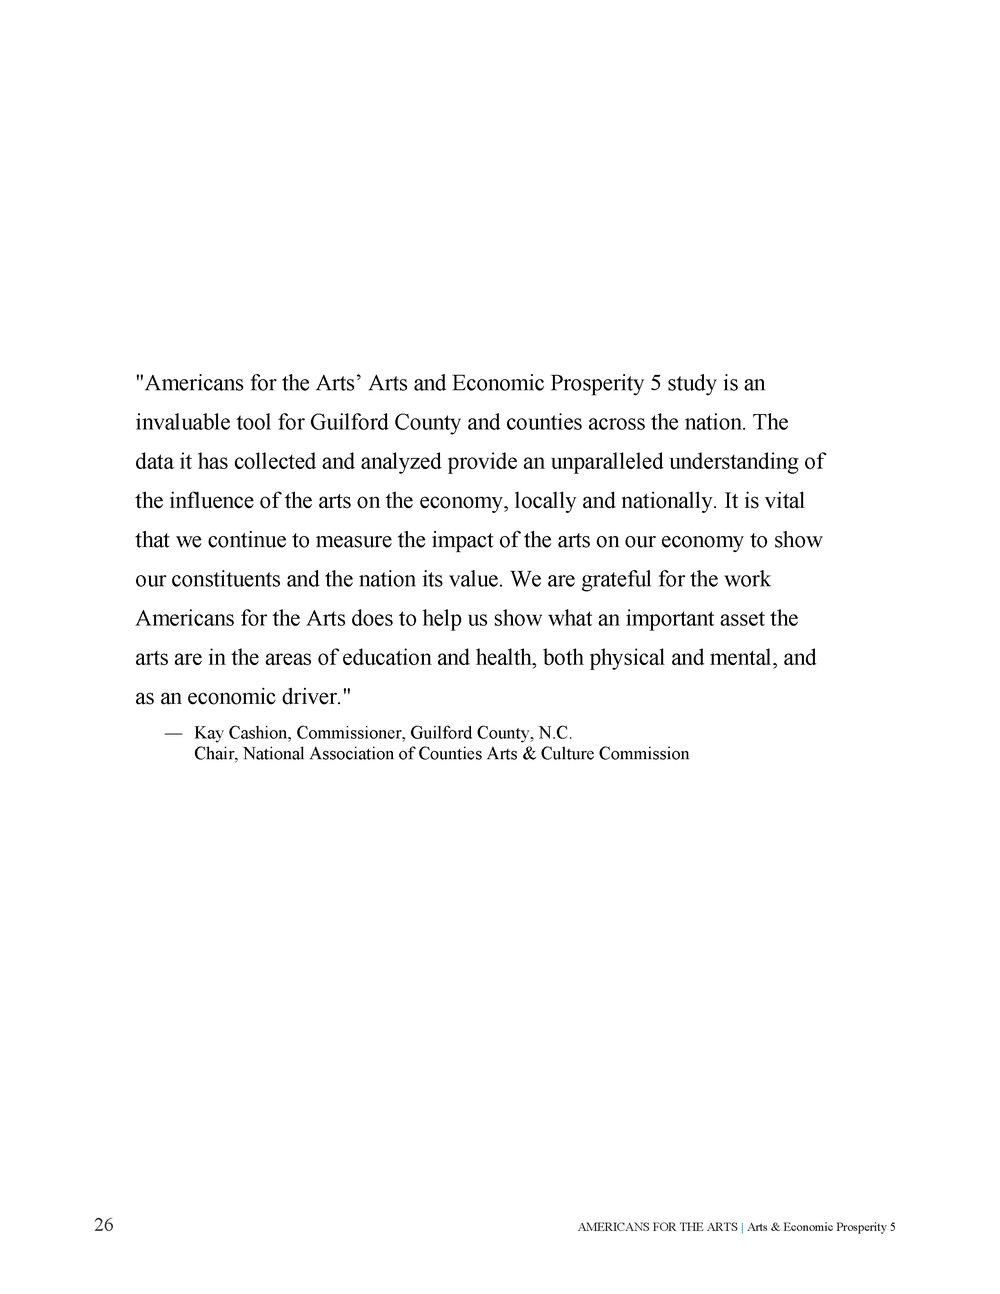 Arts & Economic Prosperity in Nevada County_Page_30.jpg